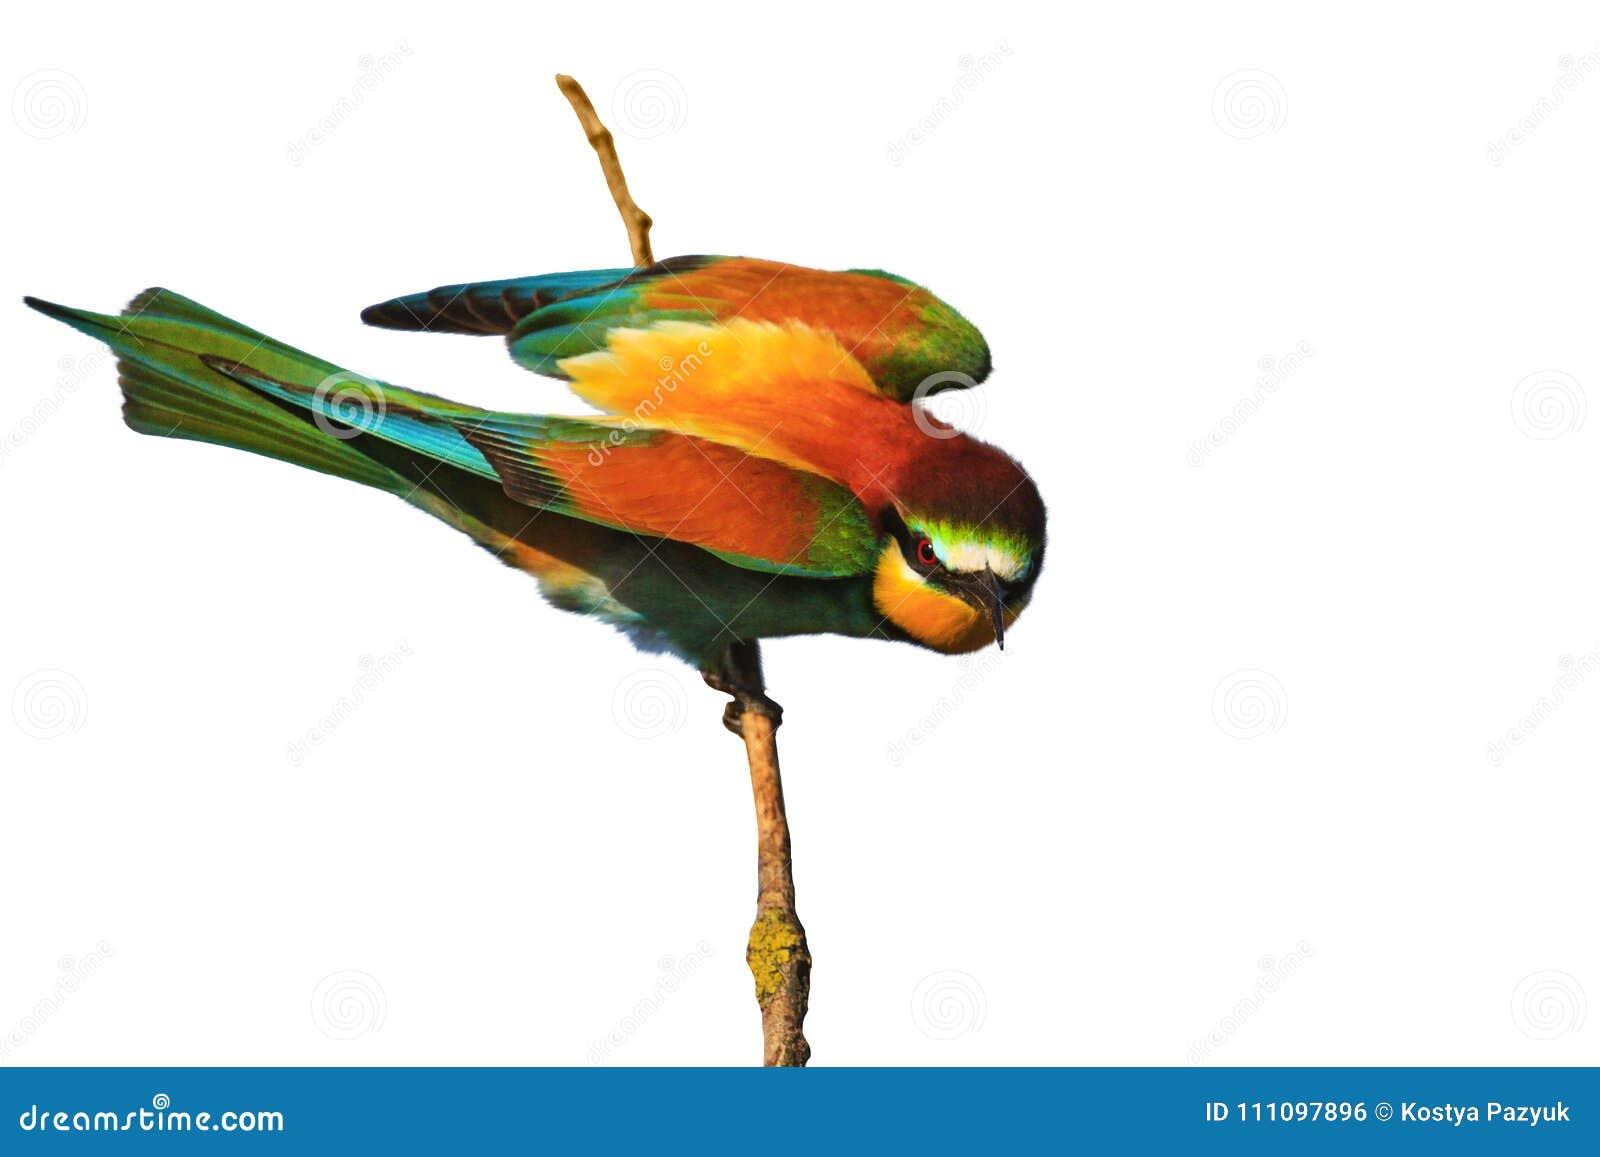 Pájaro Azul Enojado Stock Images - Download 588 Photos